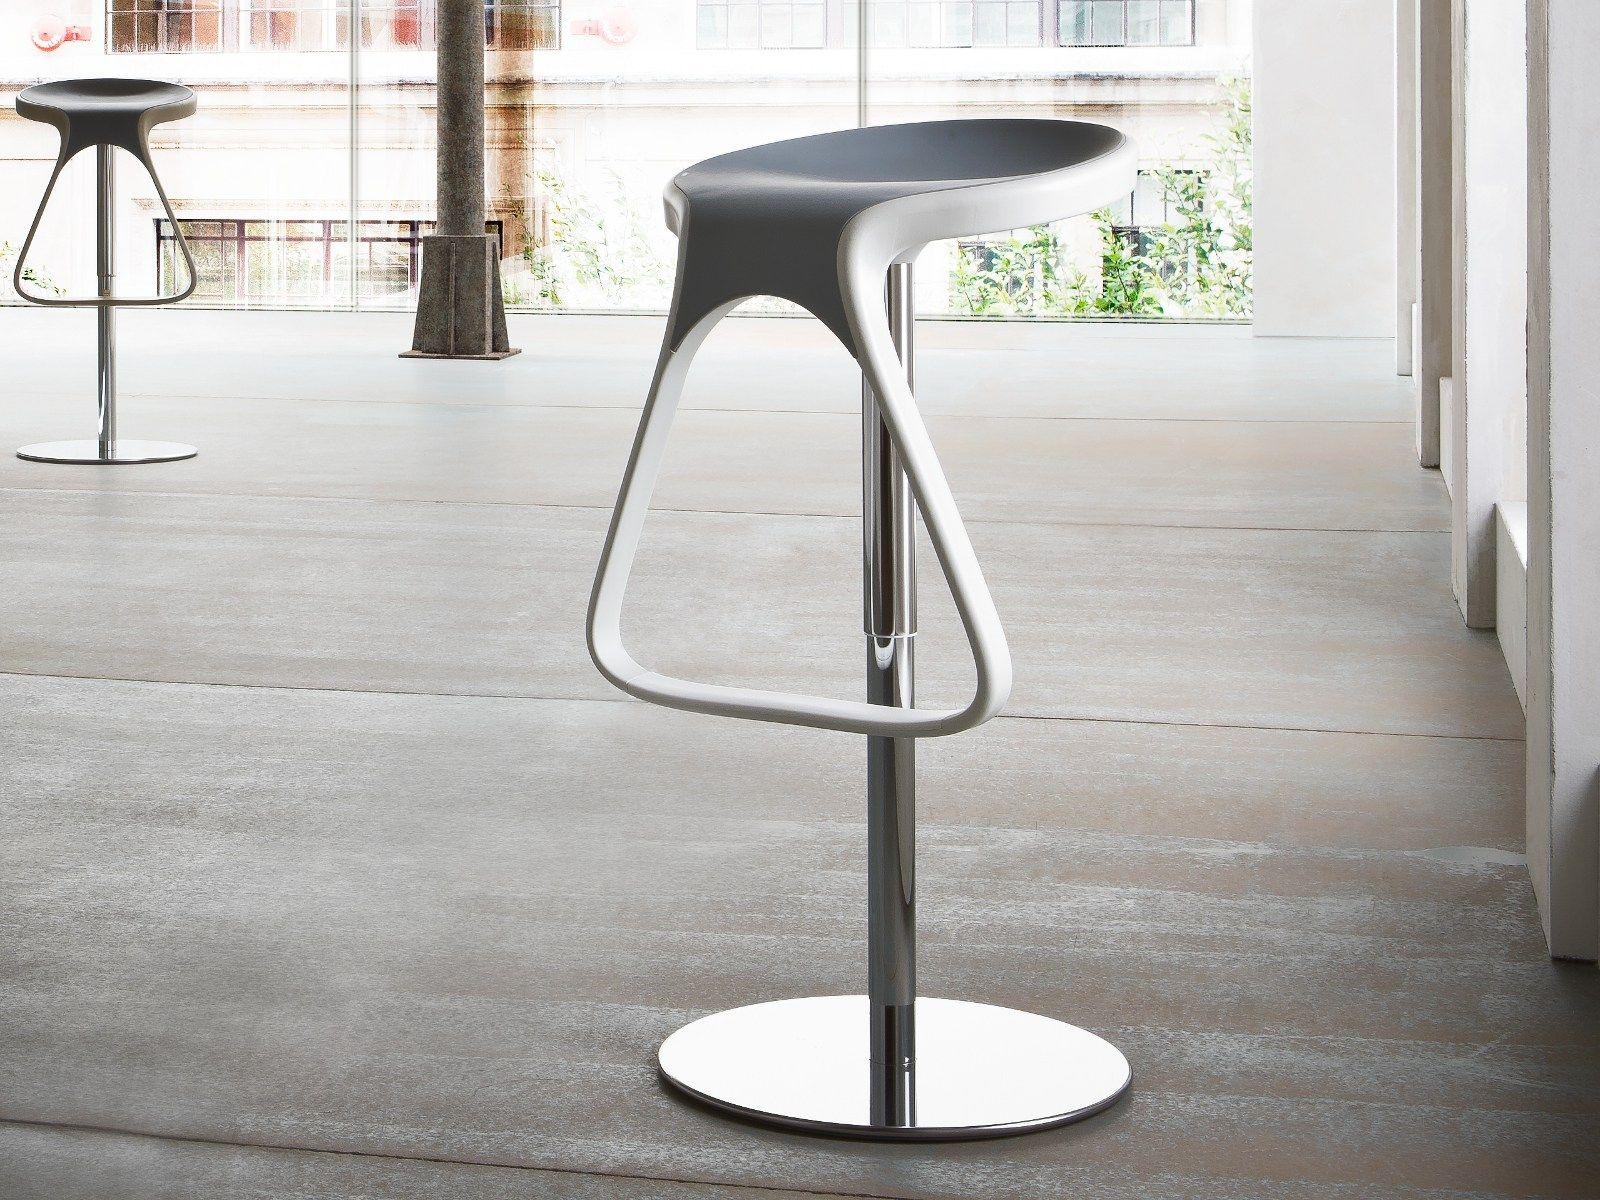 heightadjustable swivel stool octo by gaber design stefano sandonà -